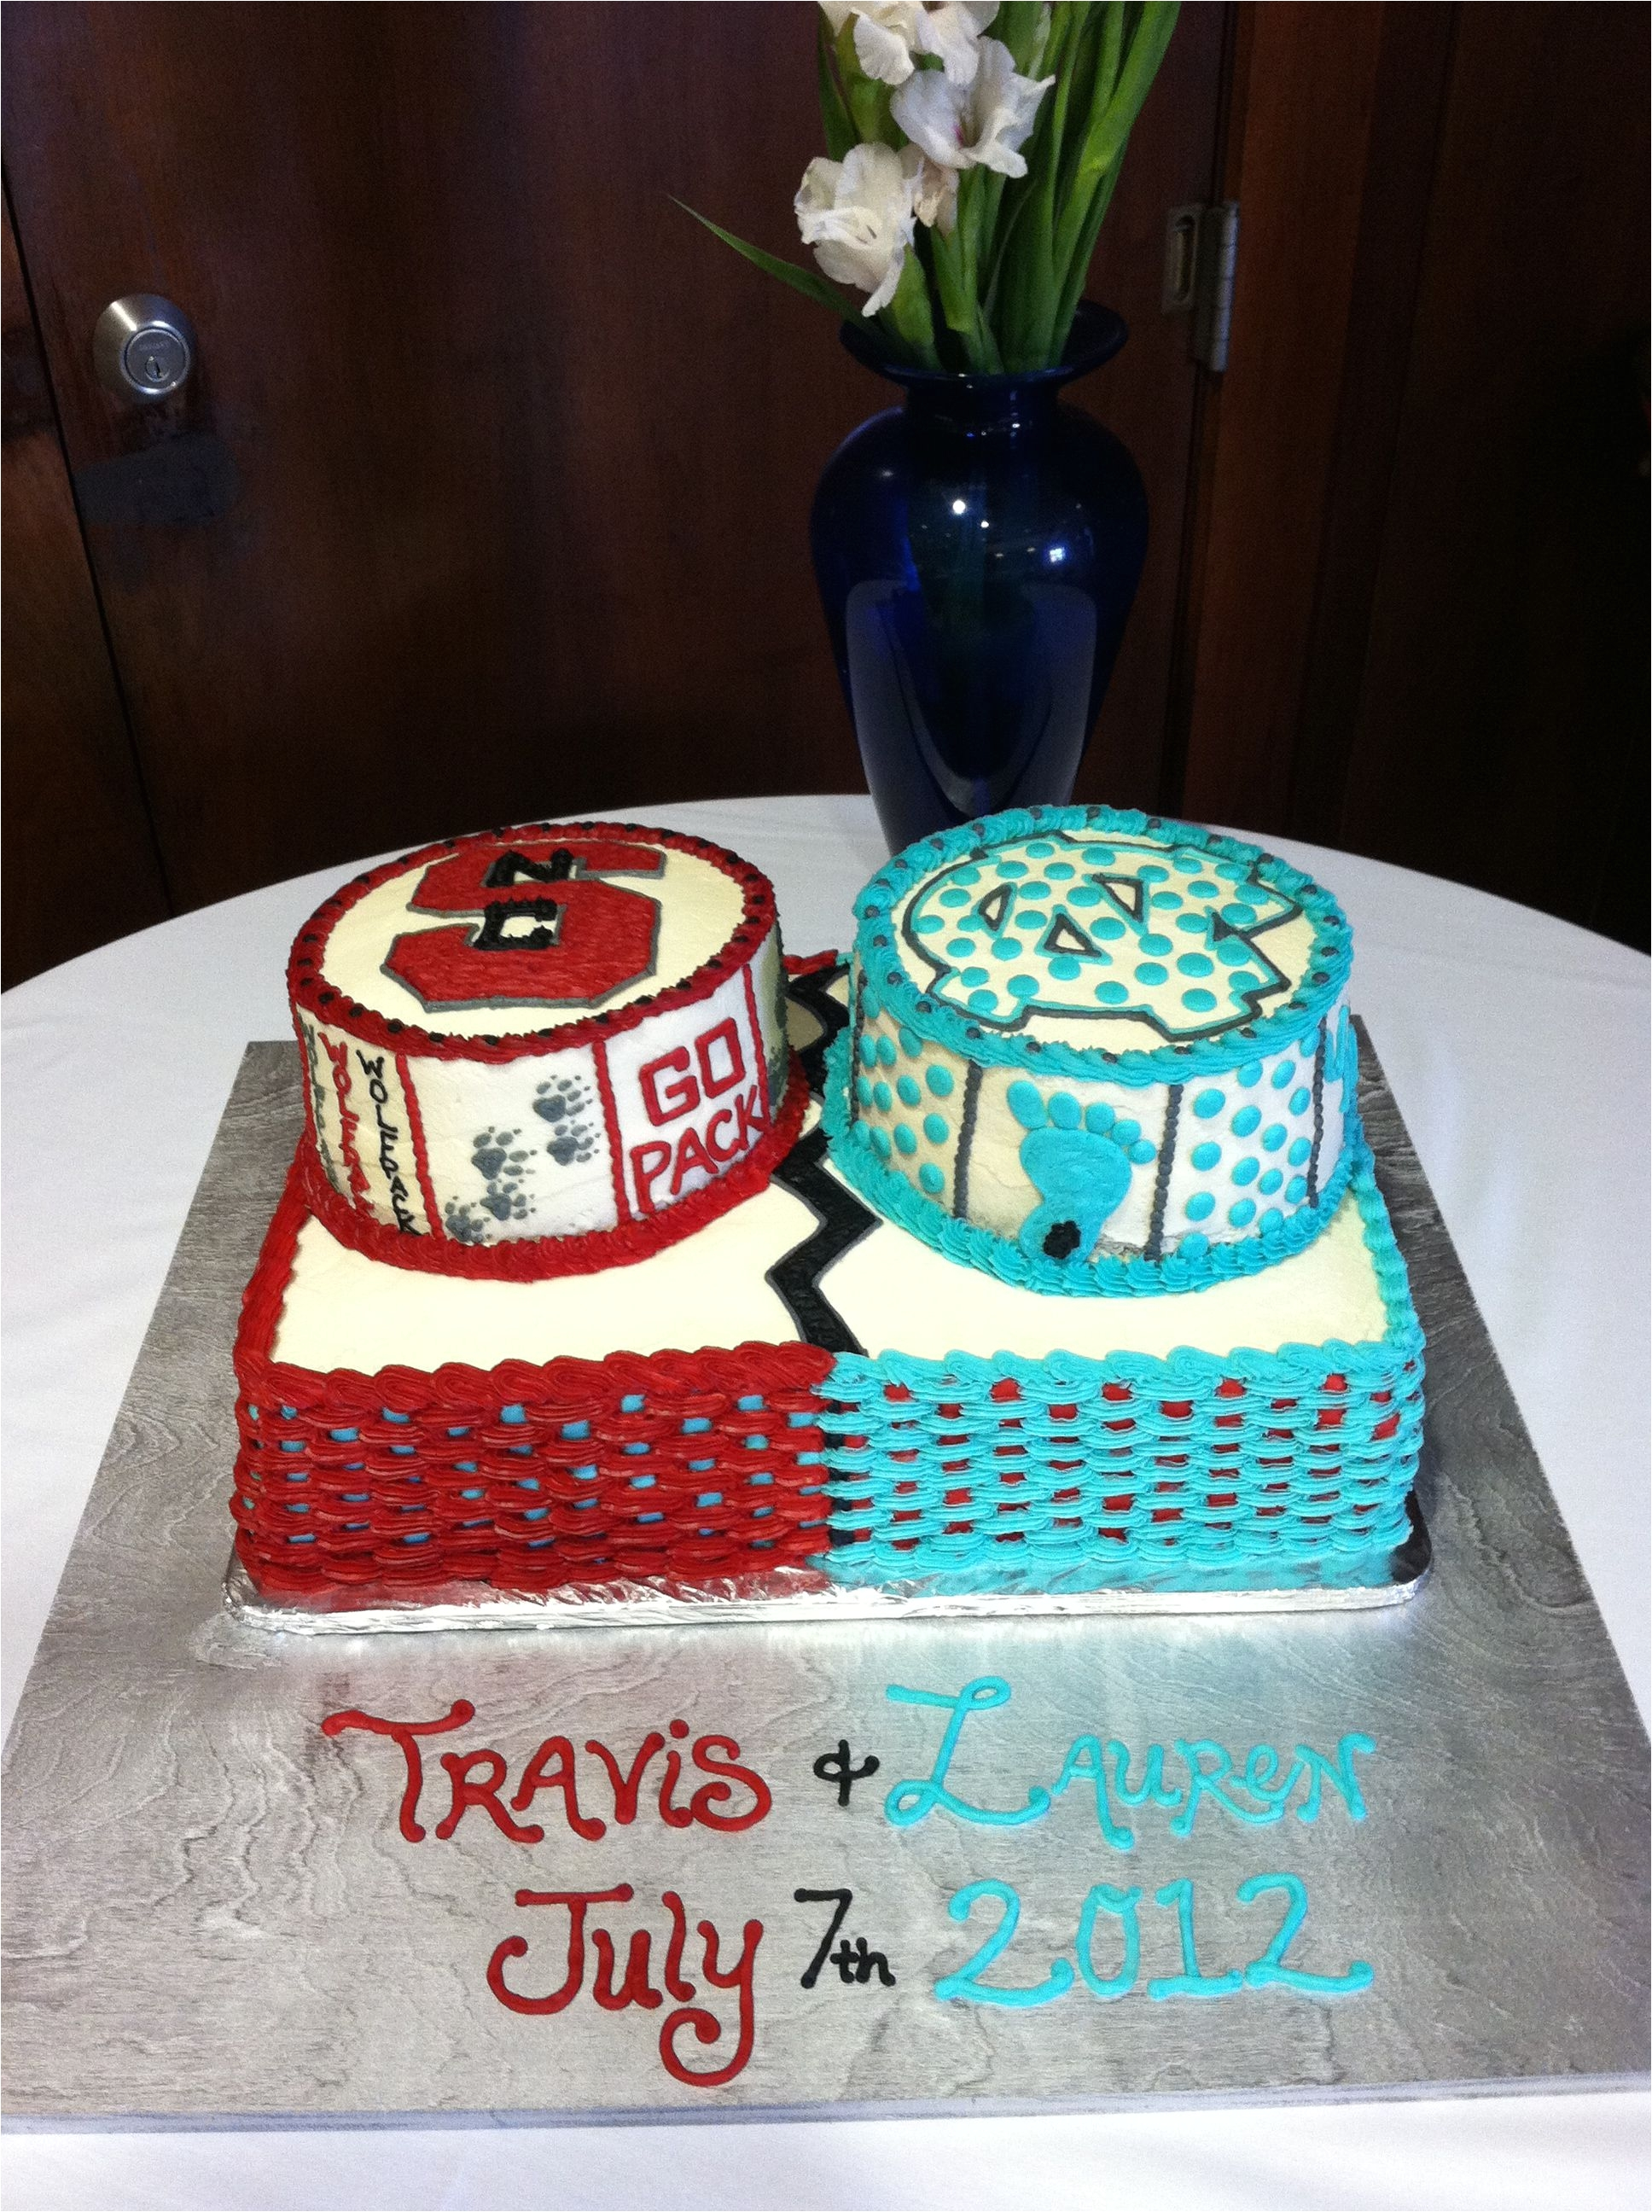 Razorback Cake Decorations House Divided Grooms Cake Cakepins Com Wedding Ideas Pinterest